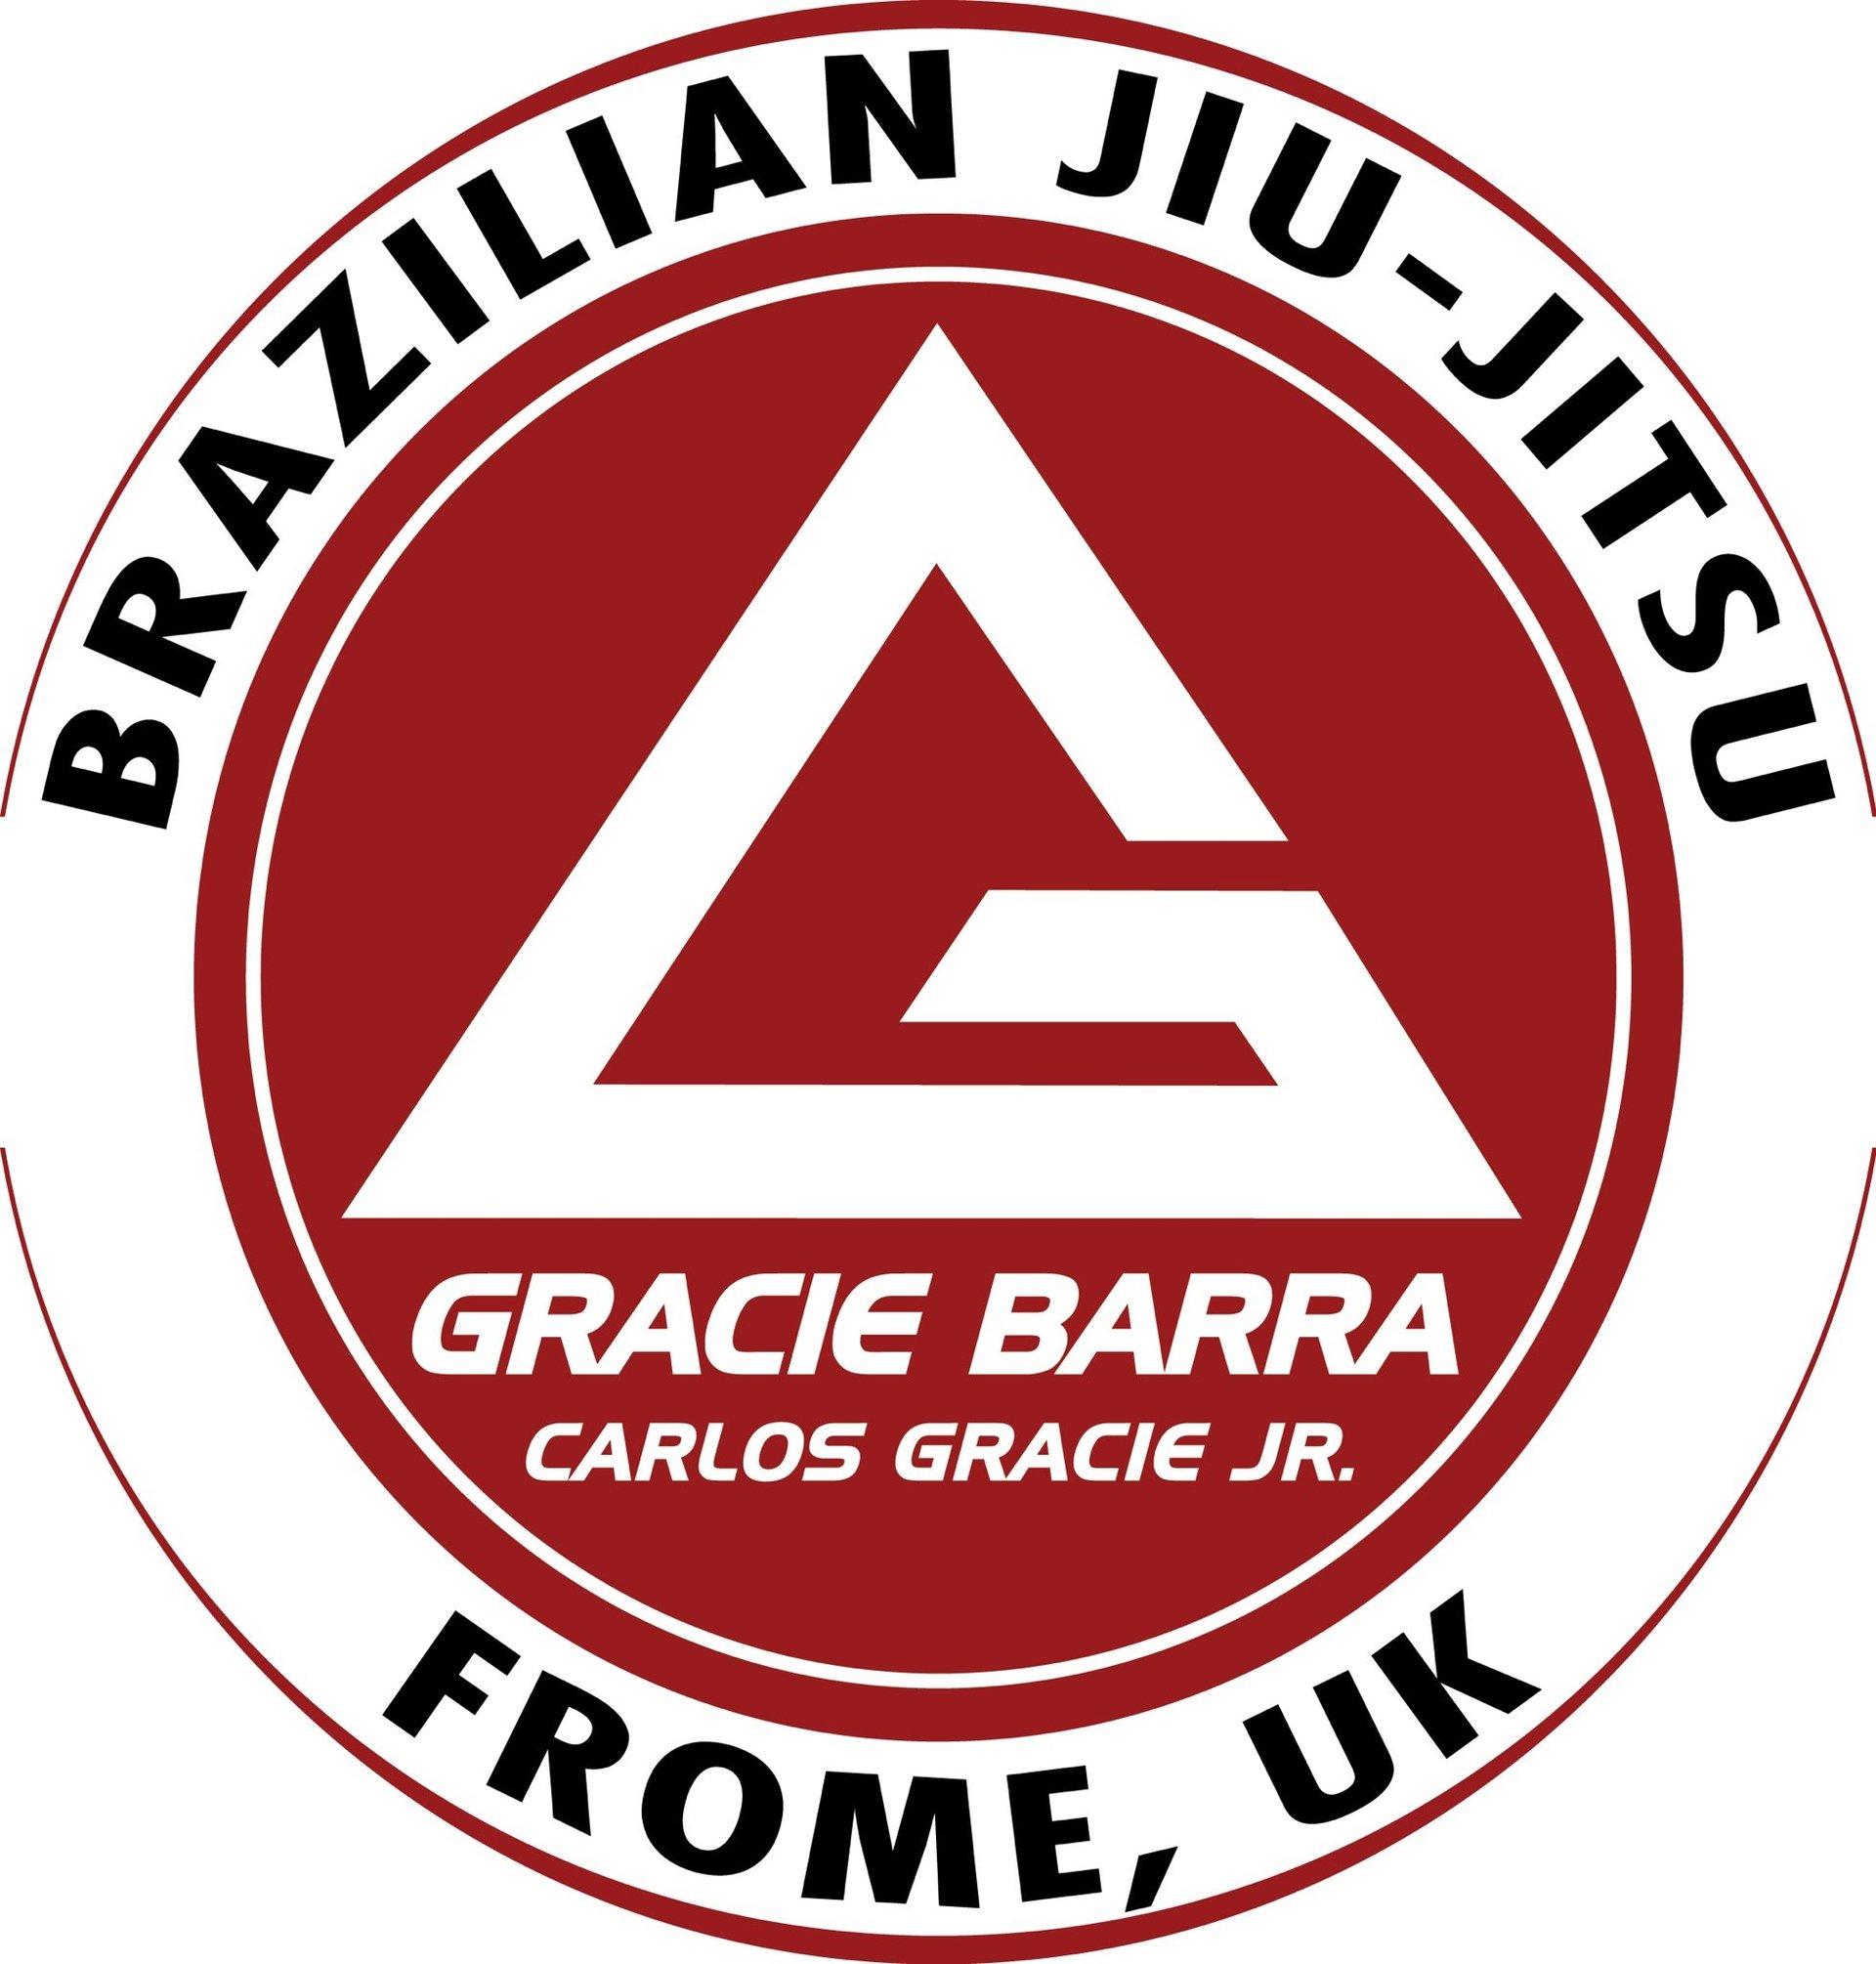 Gracie Barra Frome Brazilian Jiu-Jitsu and Self Defence